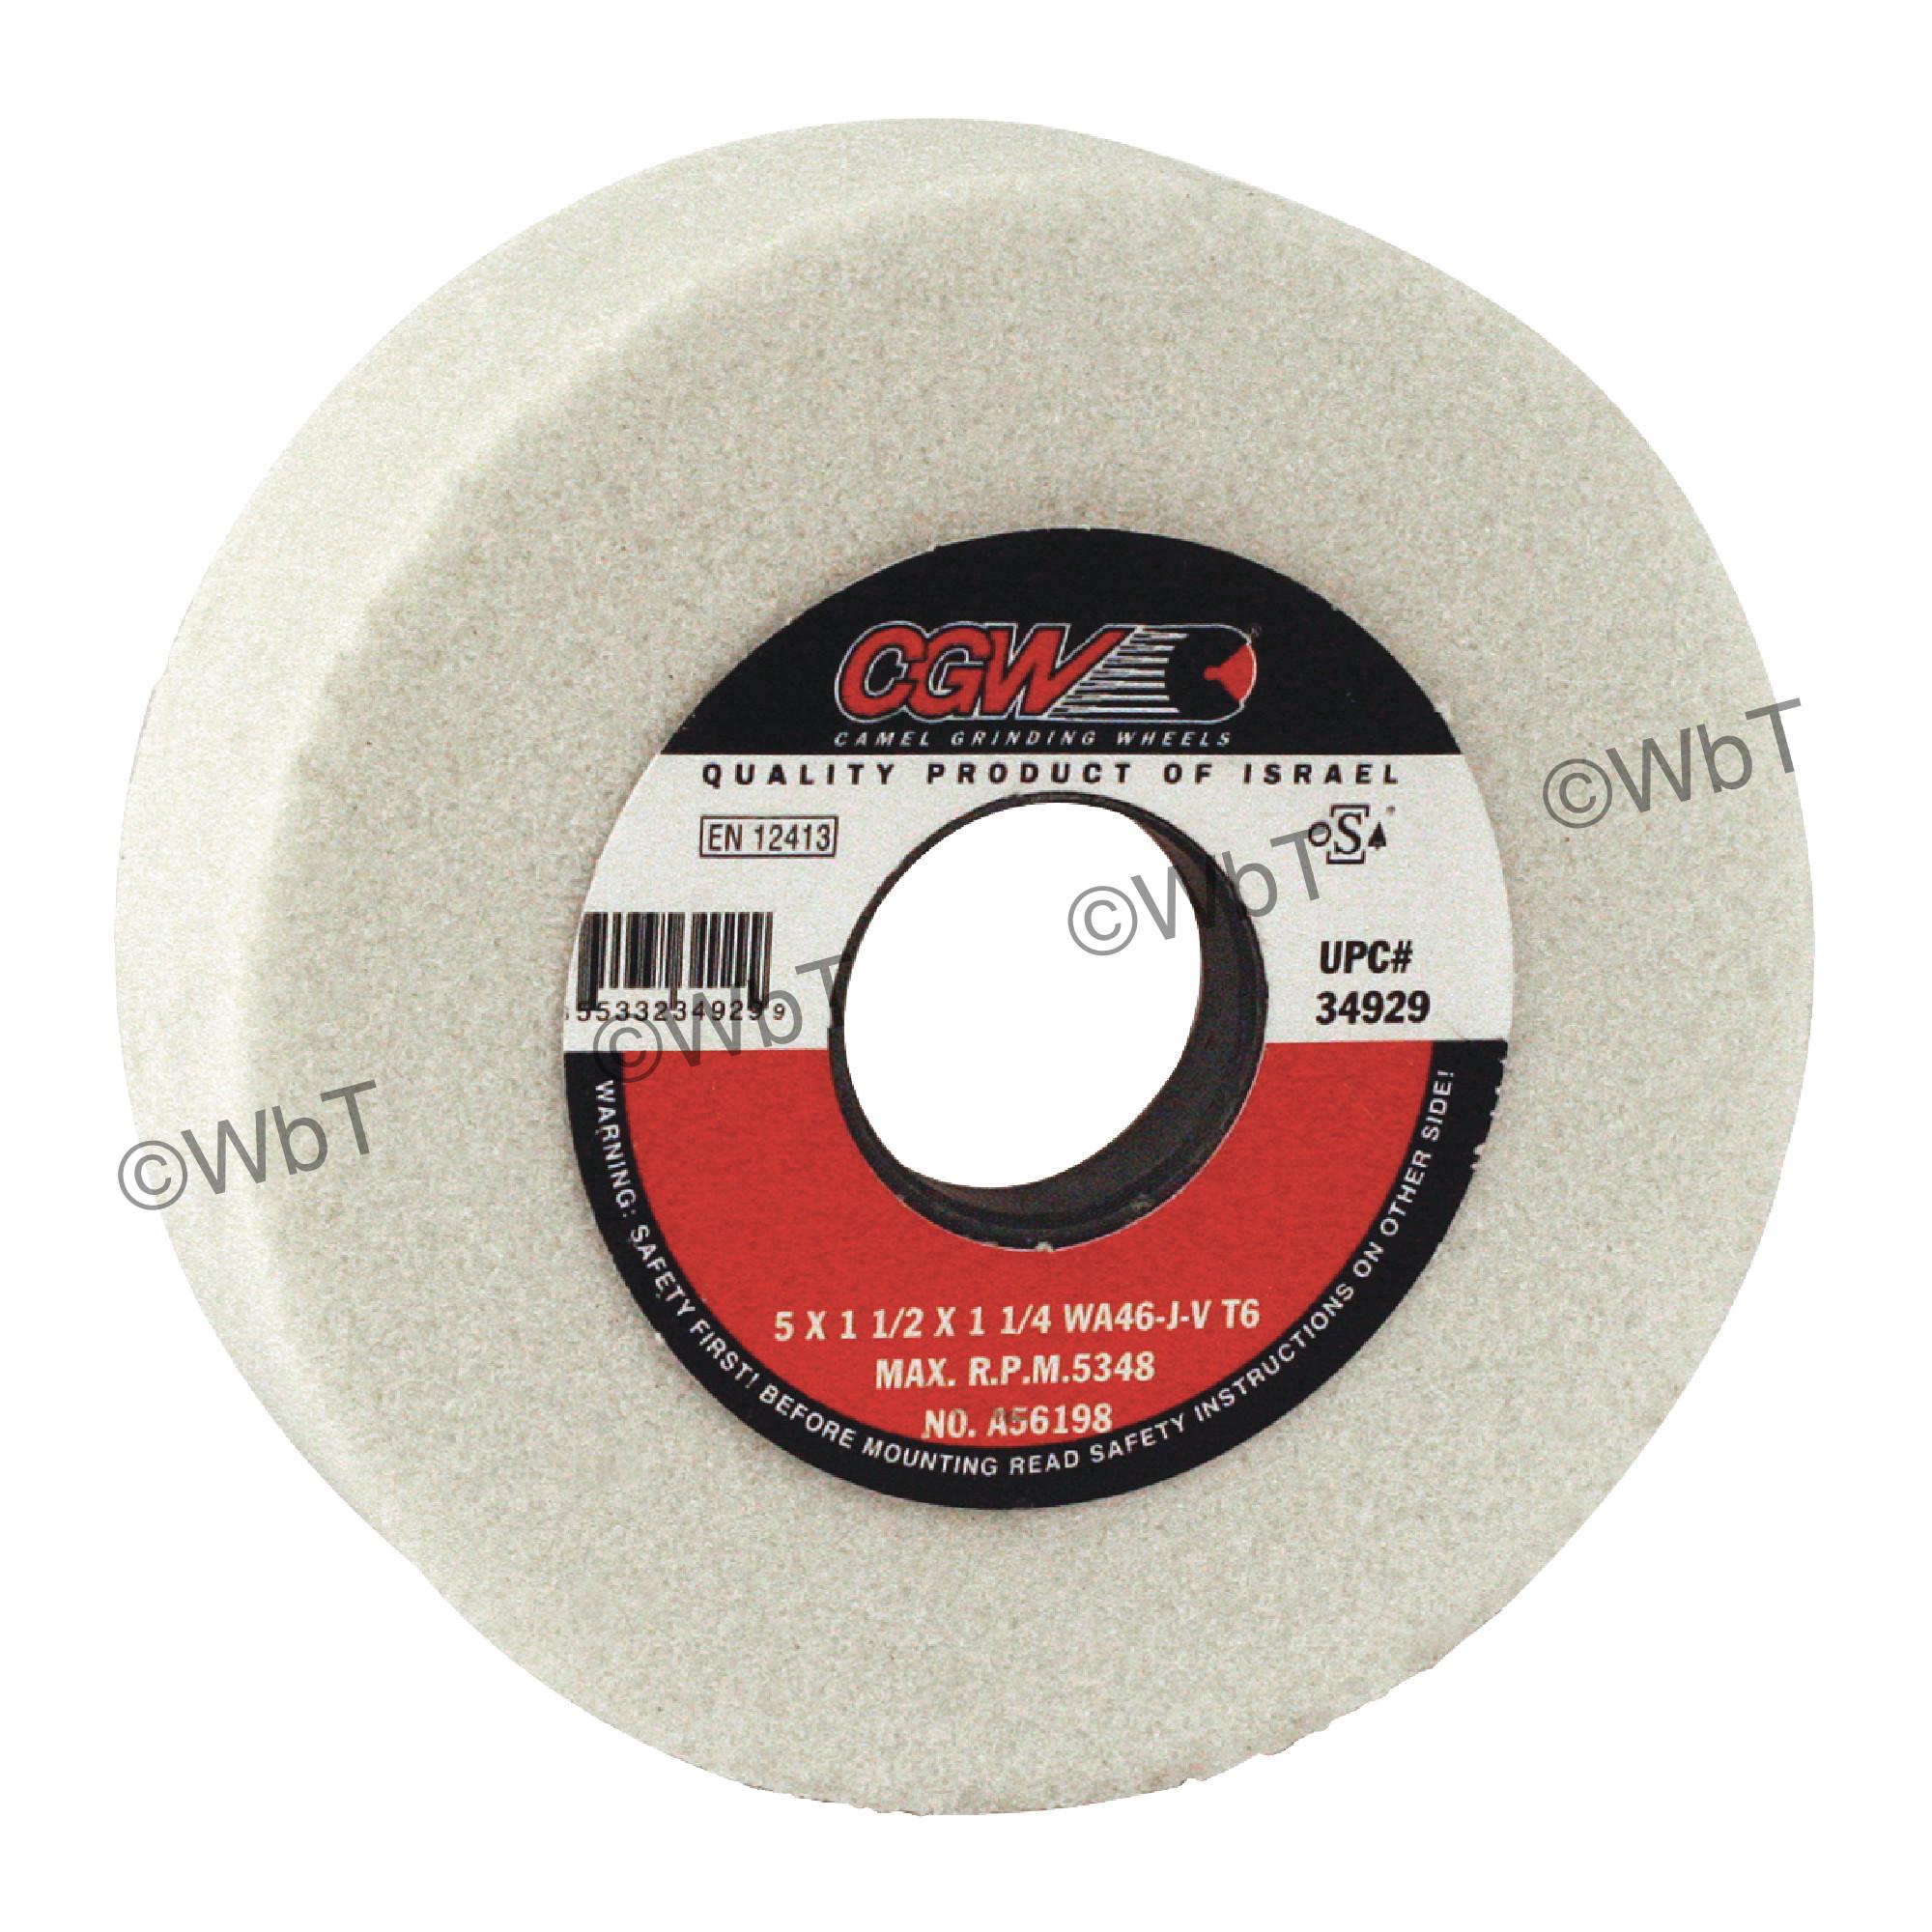 Aluminum Oxide Tool Room Surface Grinding Wheel